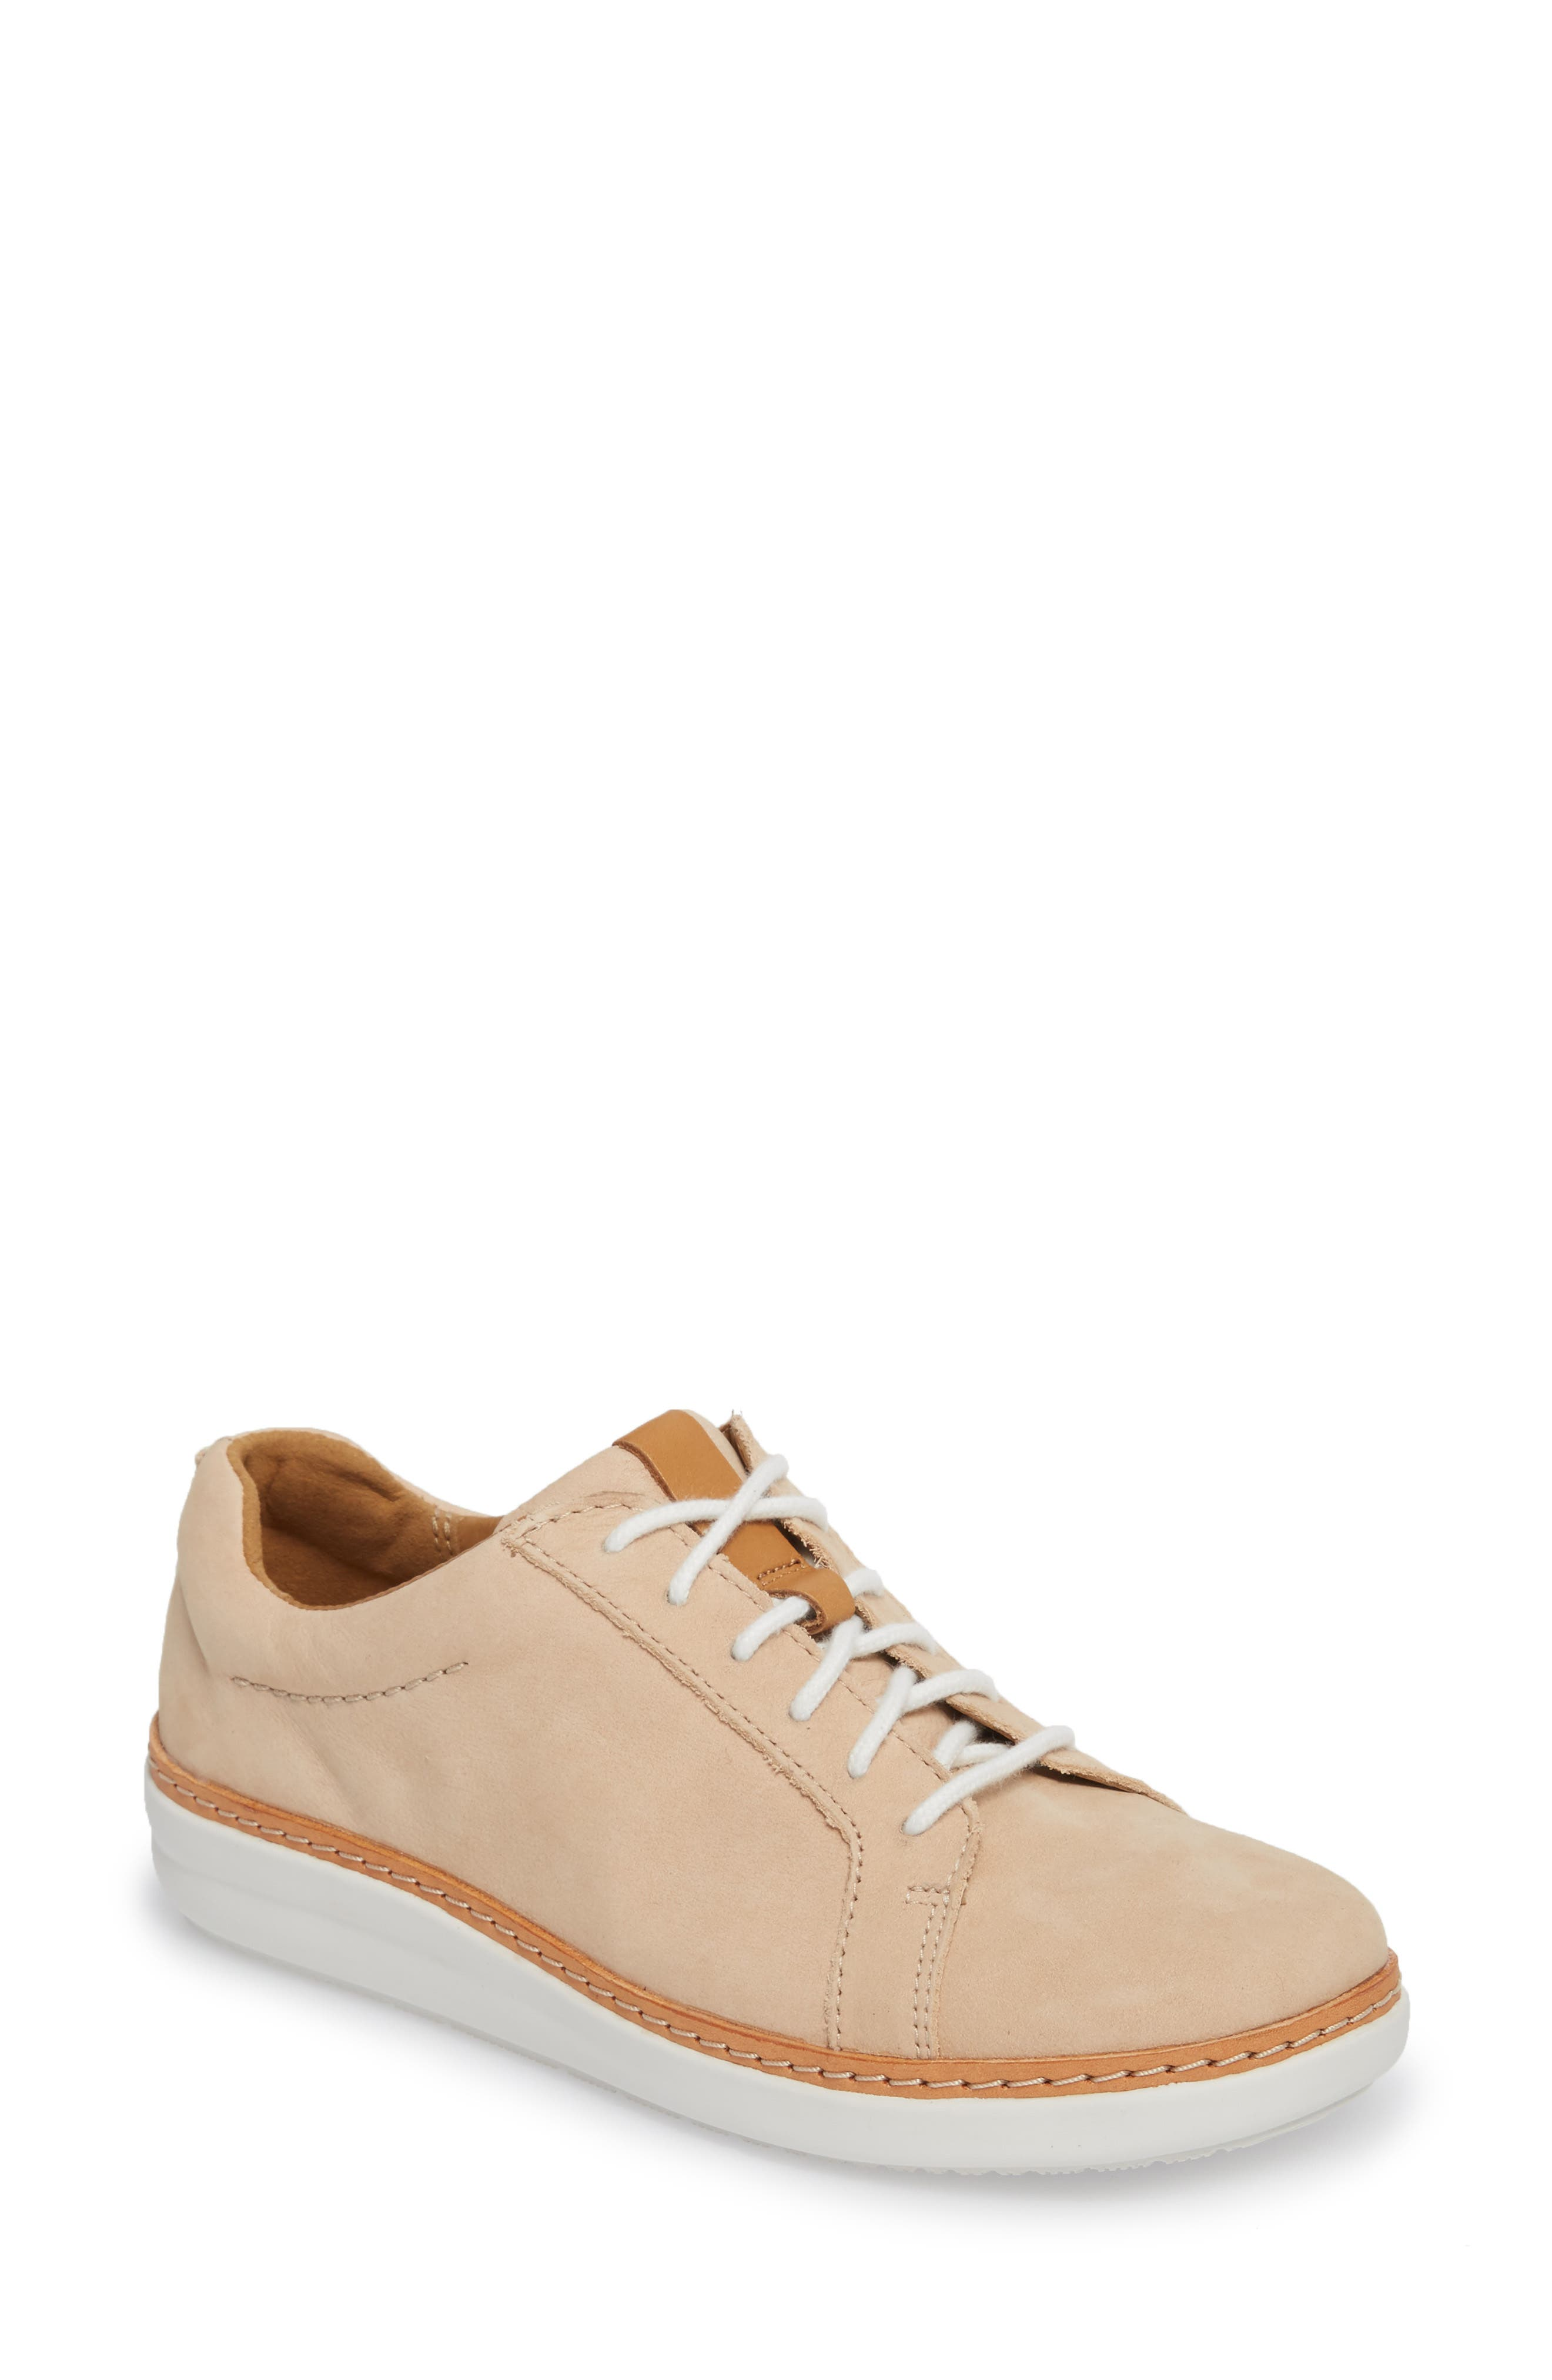 Amberlee Rosa Sneaker,                             Main thumbnail 1, color,                             NUDE NUBUCK